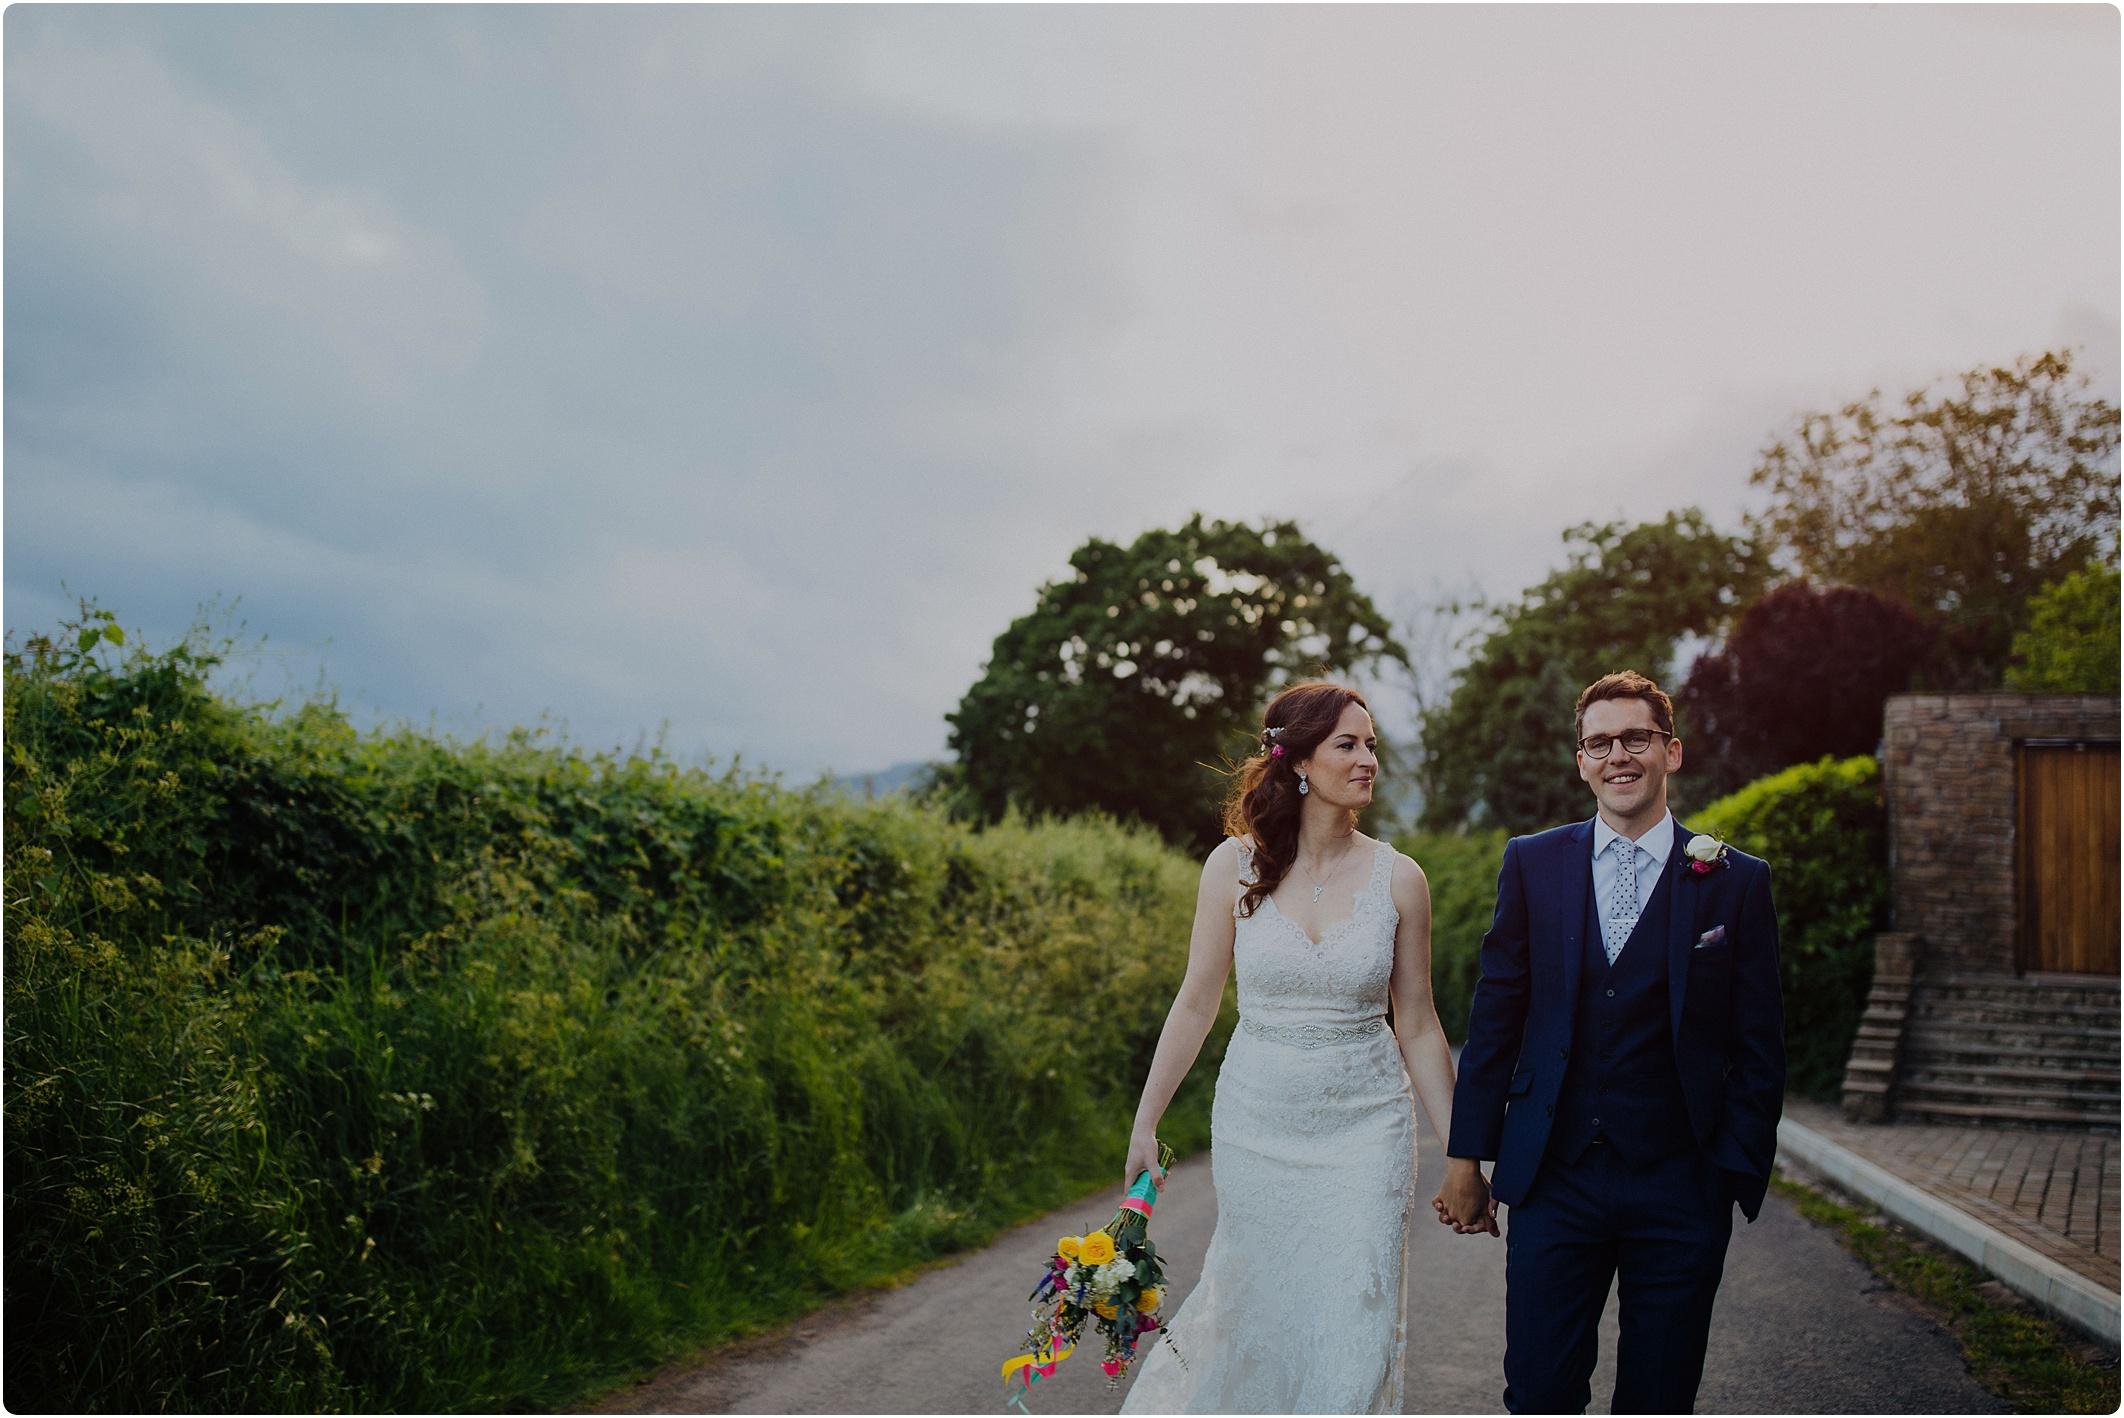 Treadam Barn Wedding bride and groom walking up lane